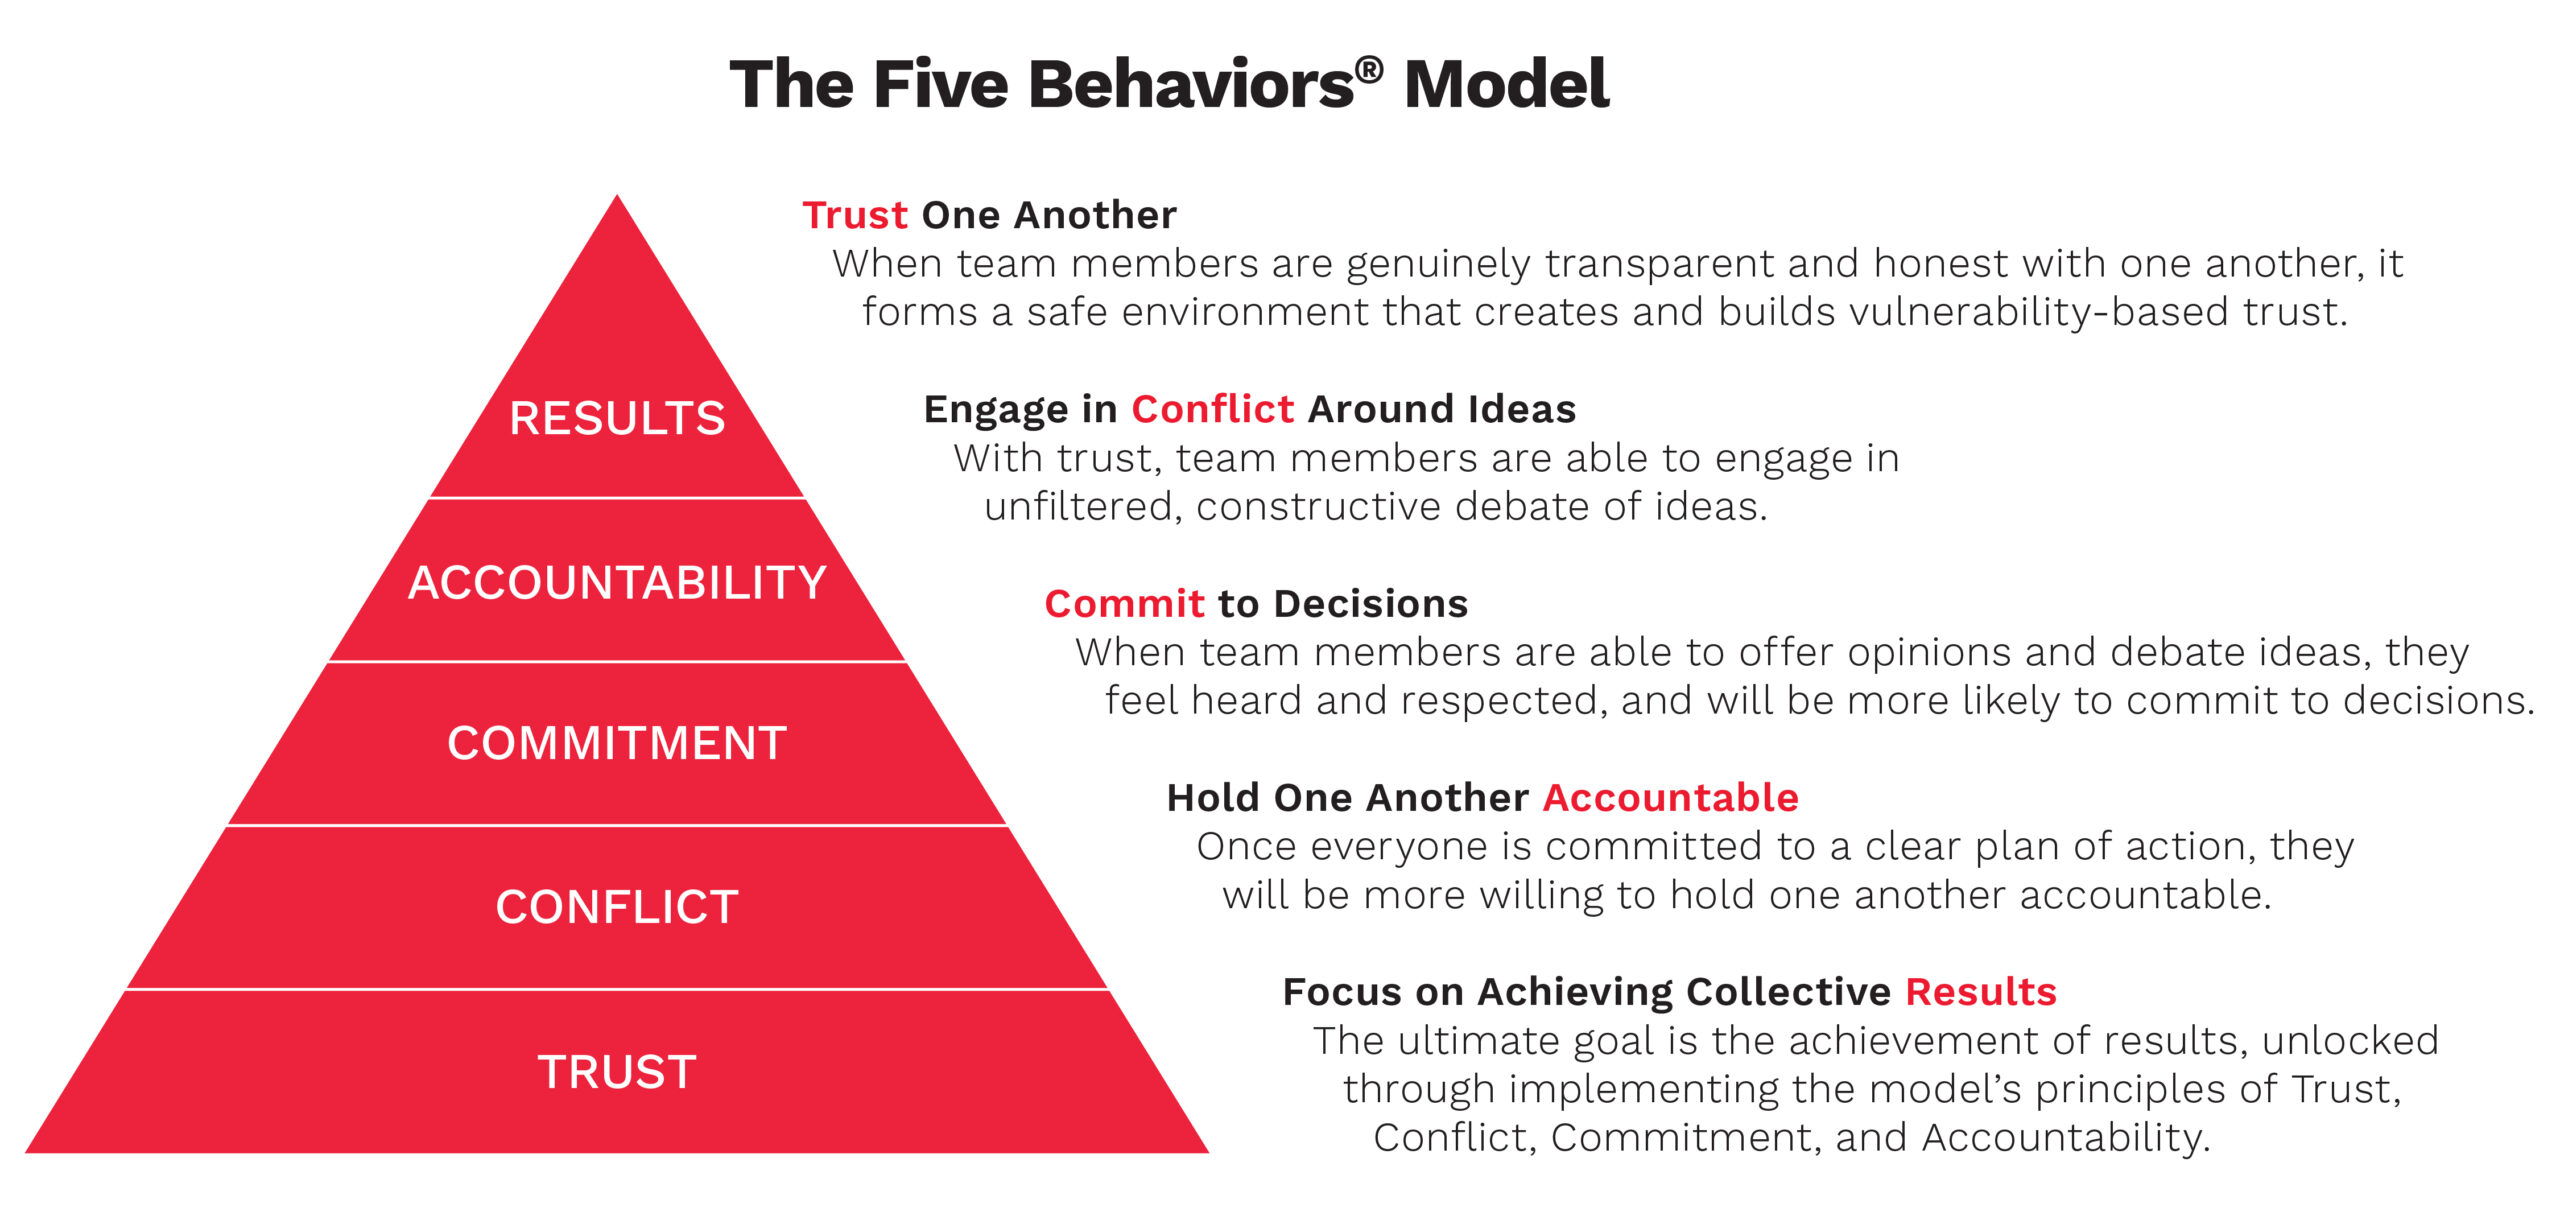 The Five Behaviors Model Pyramid